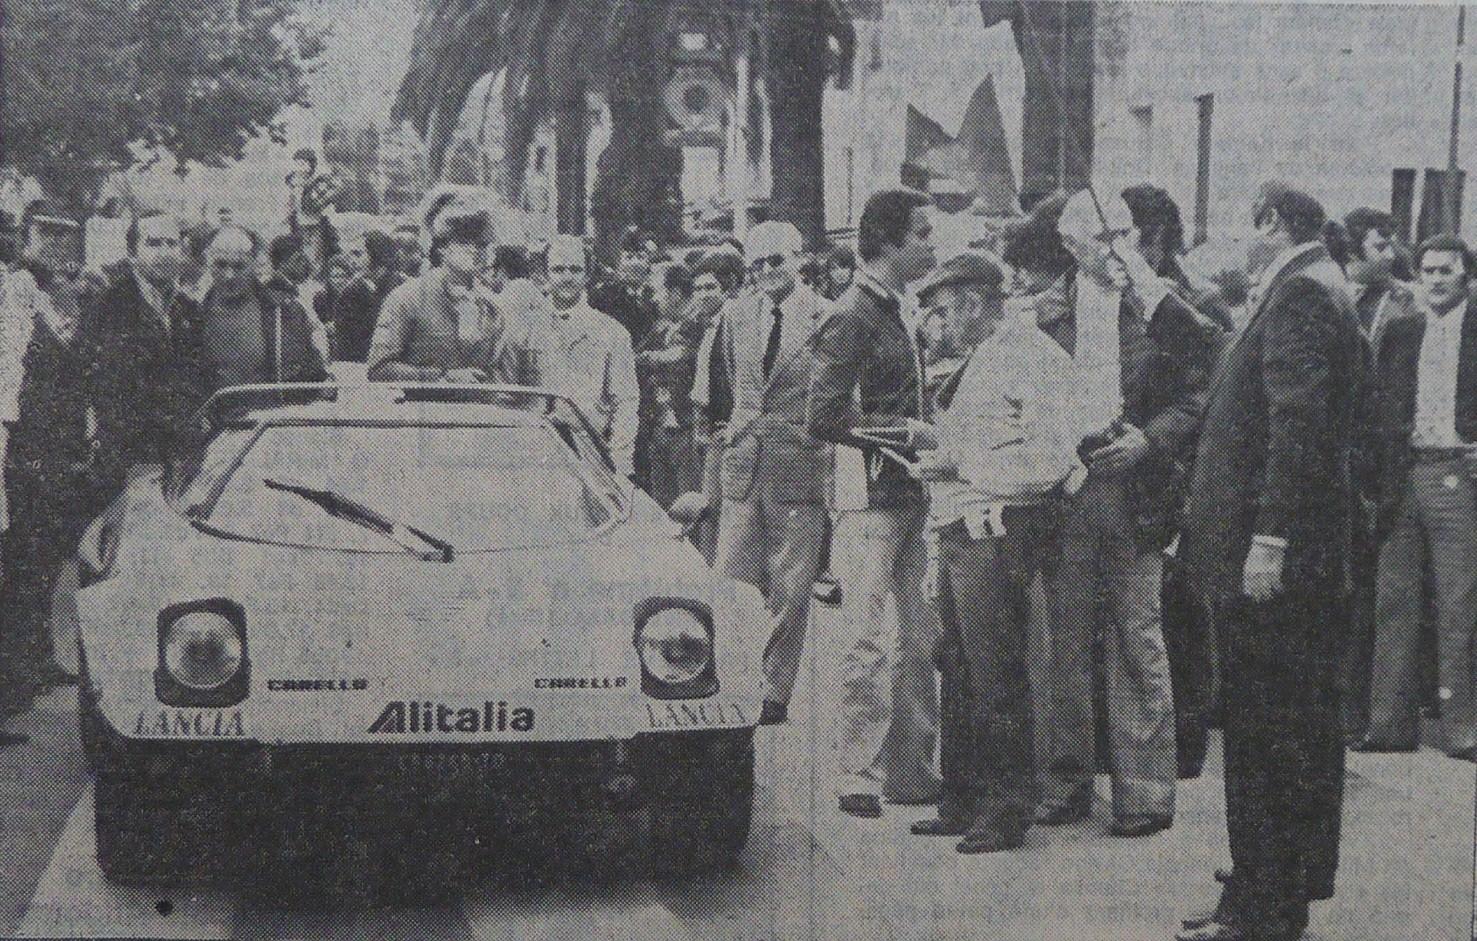 Sandro MUNARI-MANUCCI